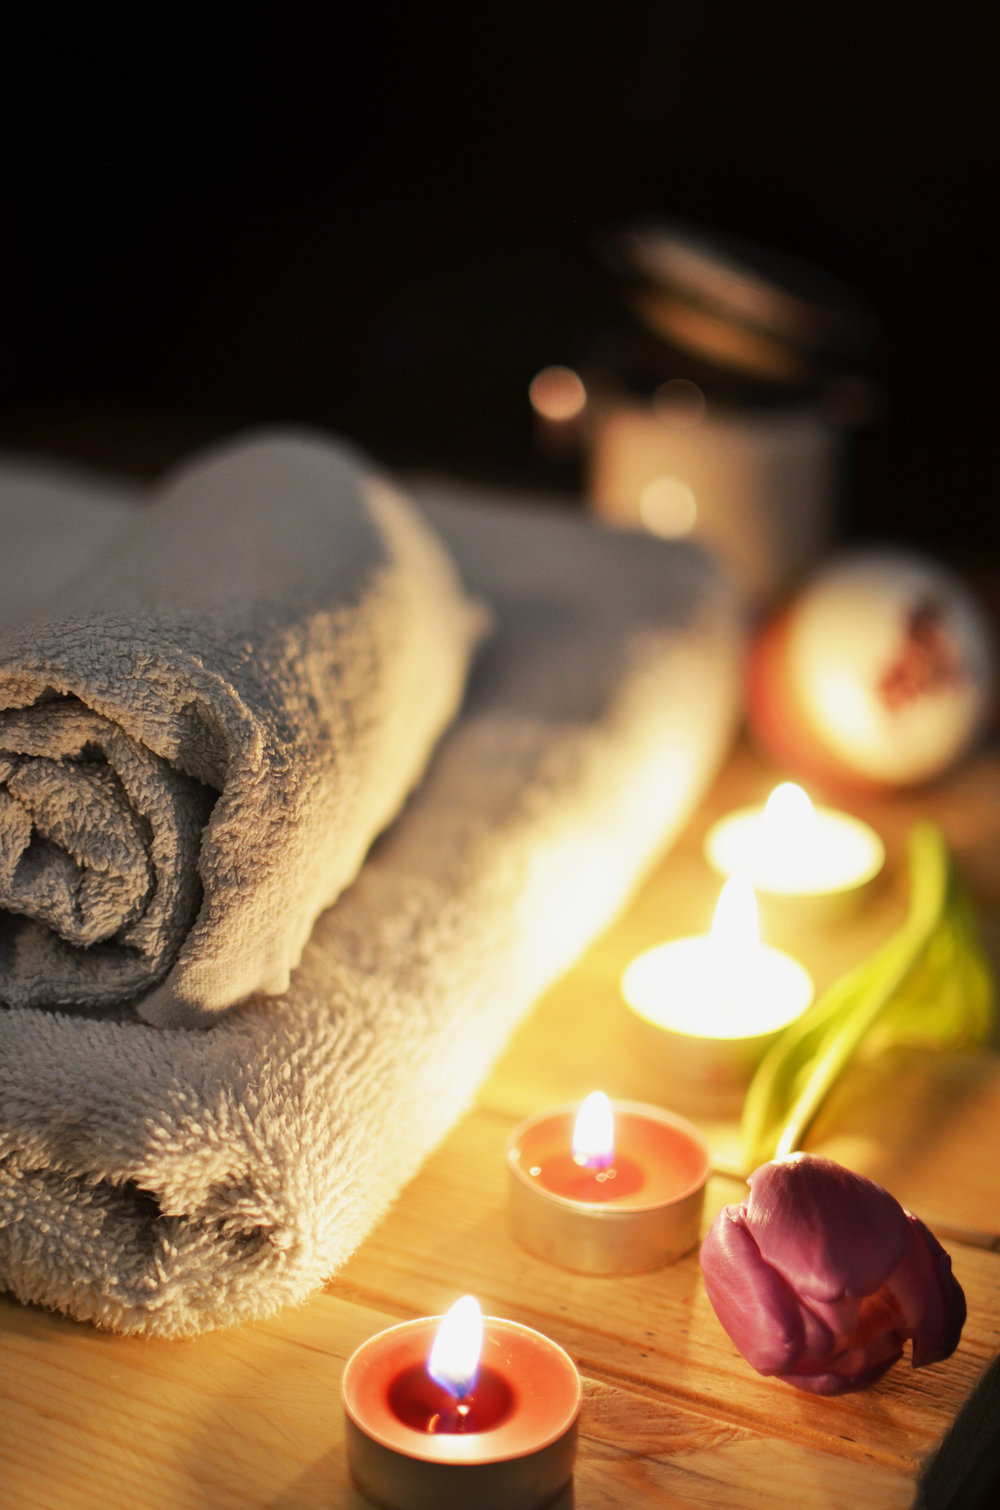 holistic-spa-massage-houston.jpg